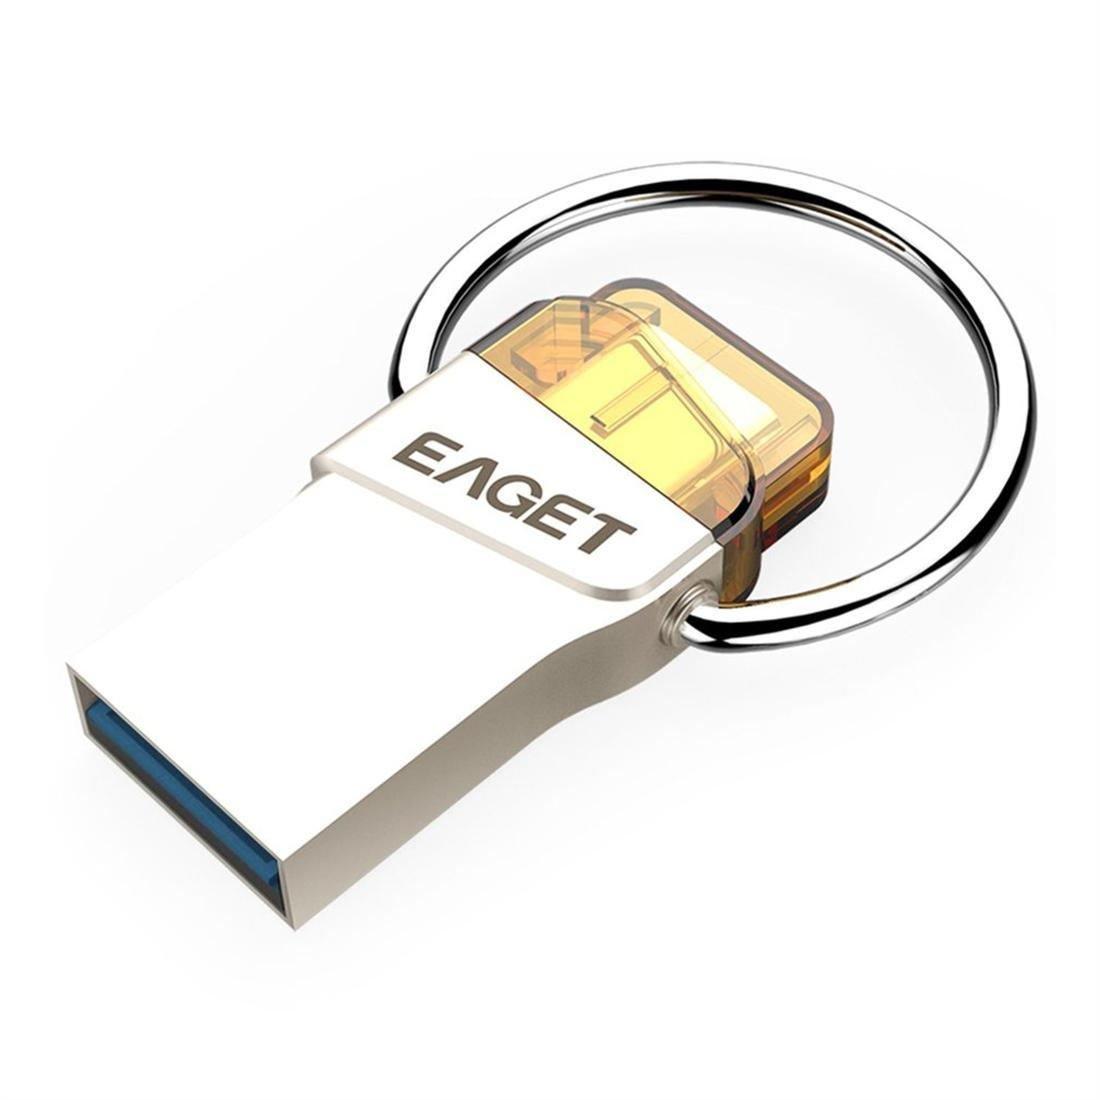 EAGET CU66 Type-C USB 3.0 OTG Flash Drive Mini Pendrive Dual Purpose U-Disk